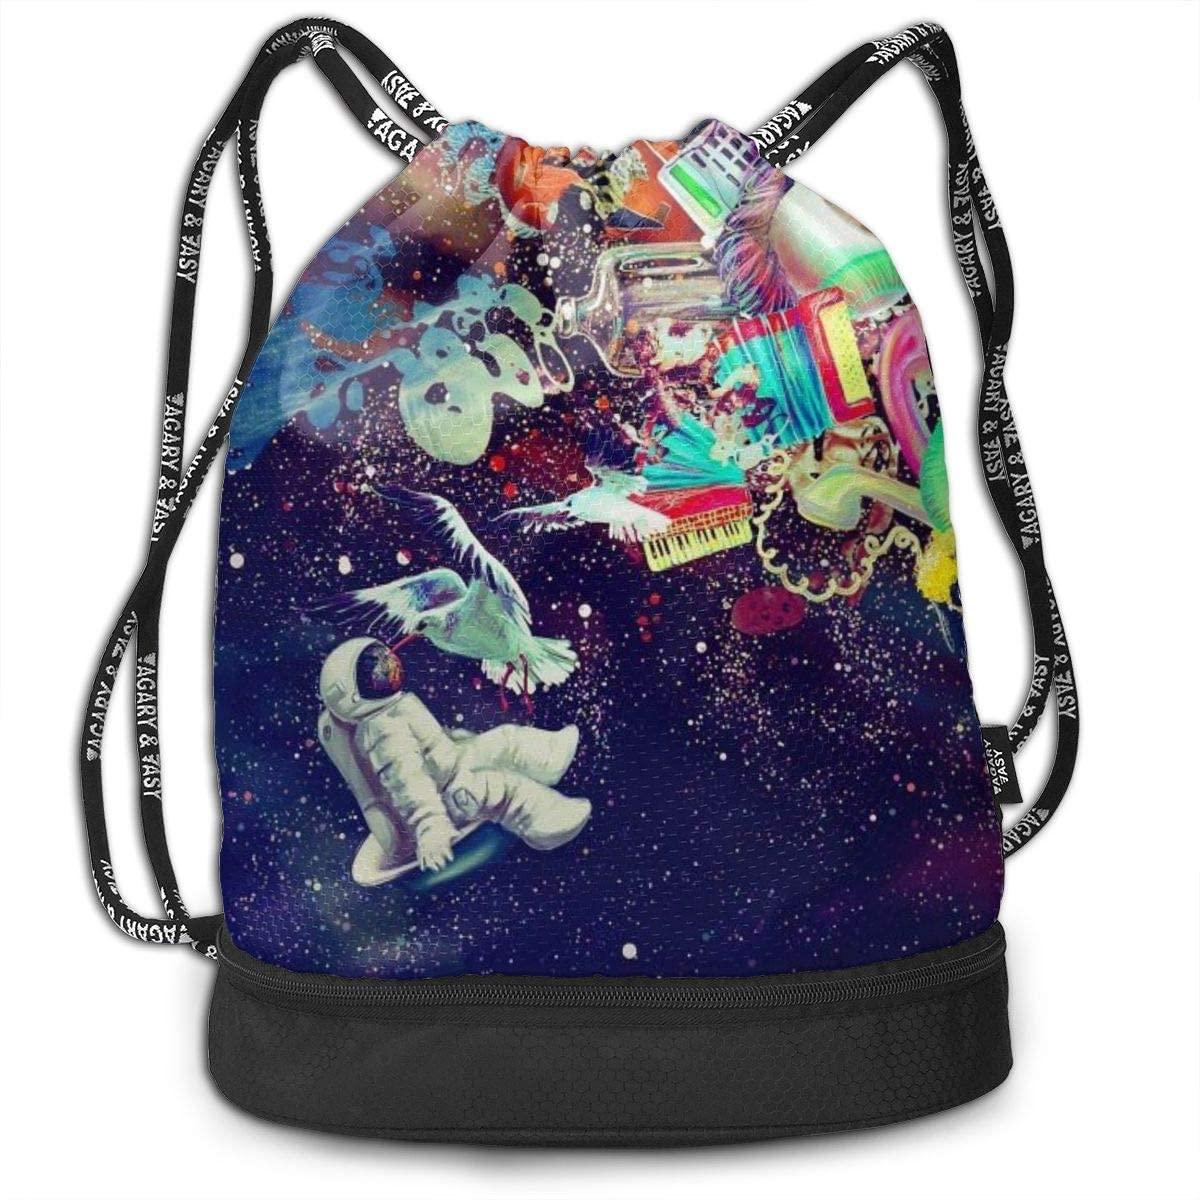 Trippy Gorgerous Space Drawstring Bag Swiming Travel Sackpack Large Capacity Beam Backpack, Home Travel Storage Use Gift For Men & Women, Girls Boys